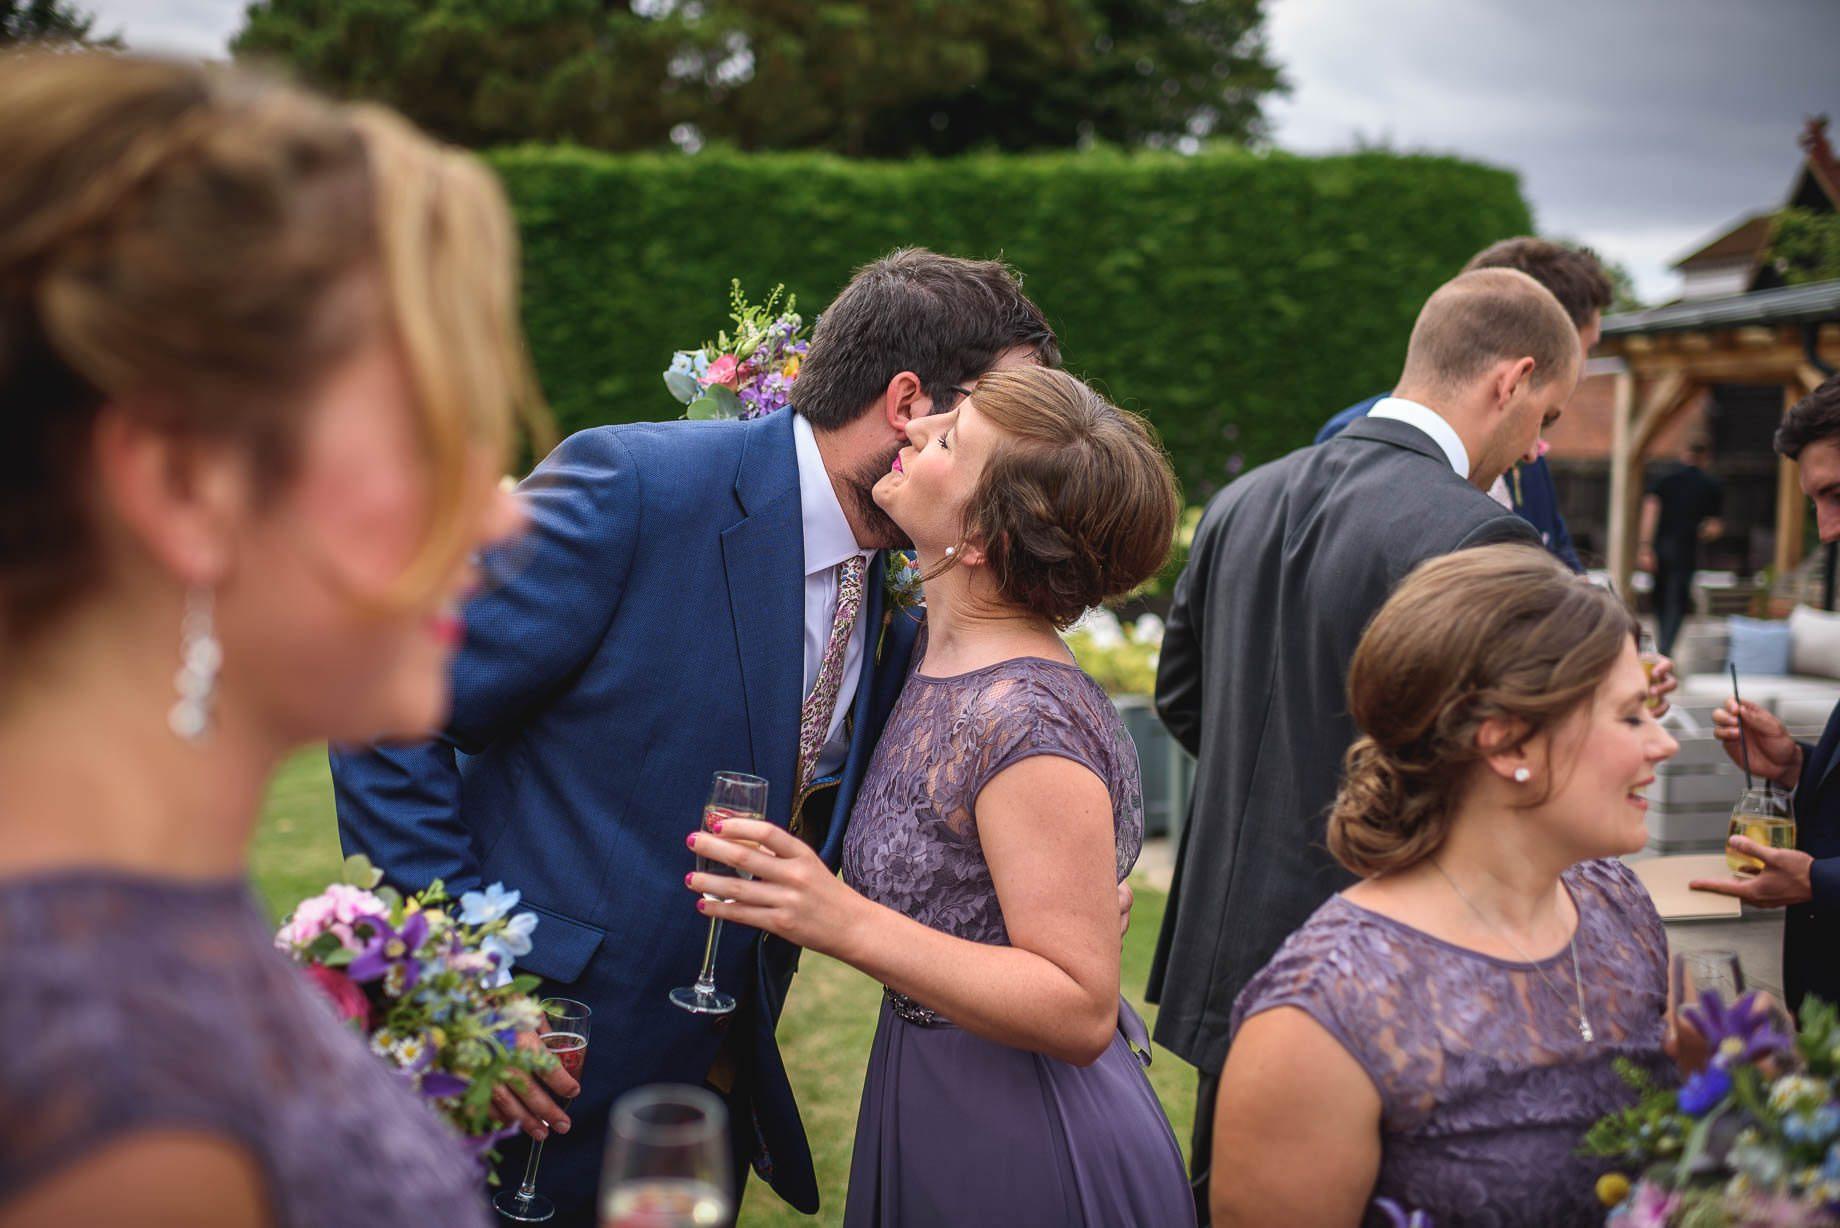 Gaynes Park wedding photography - Guy Collier Photography - Rachel and Jon (78 of 169)